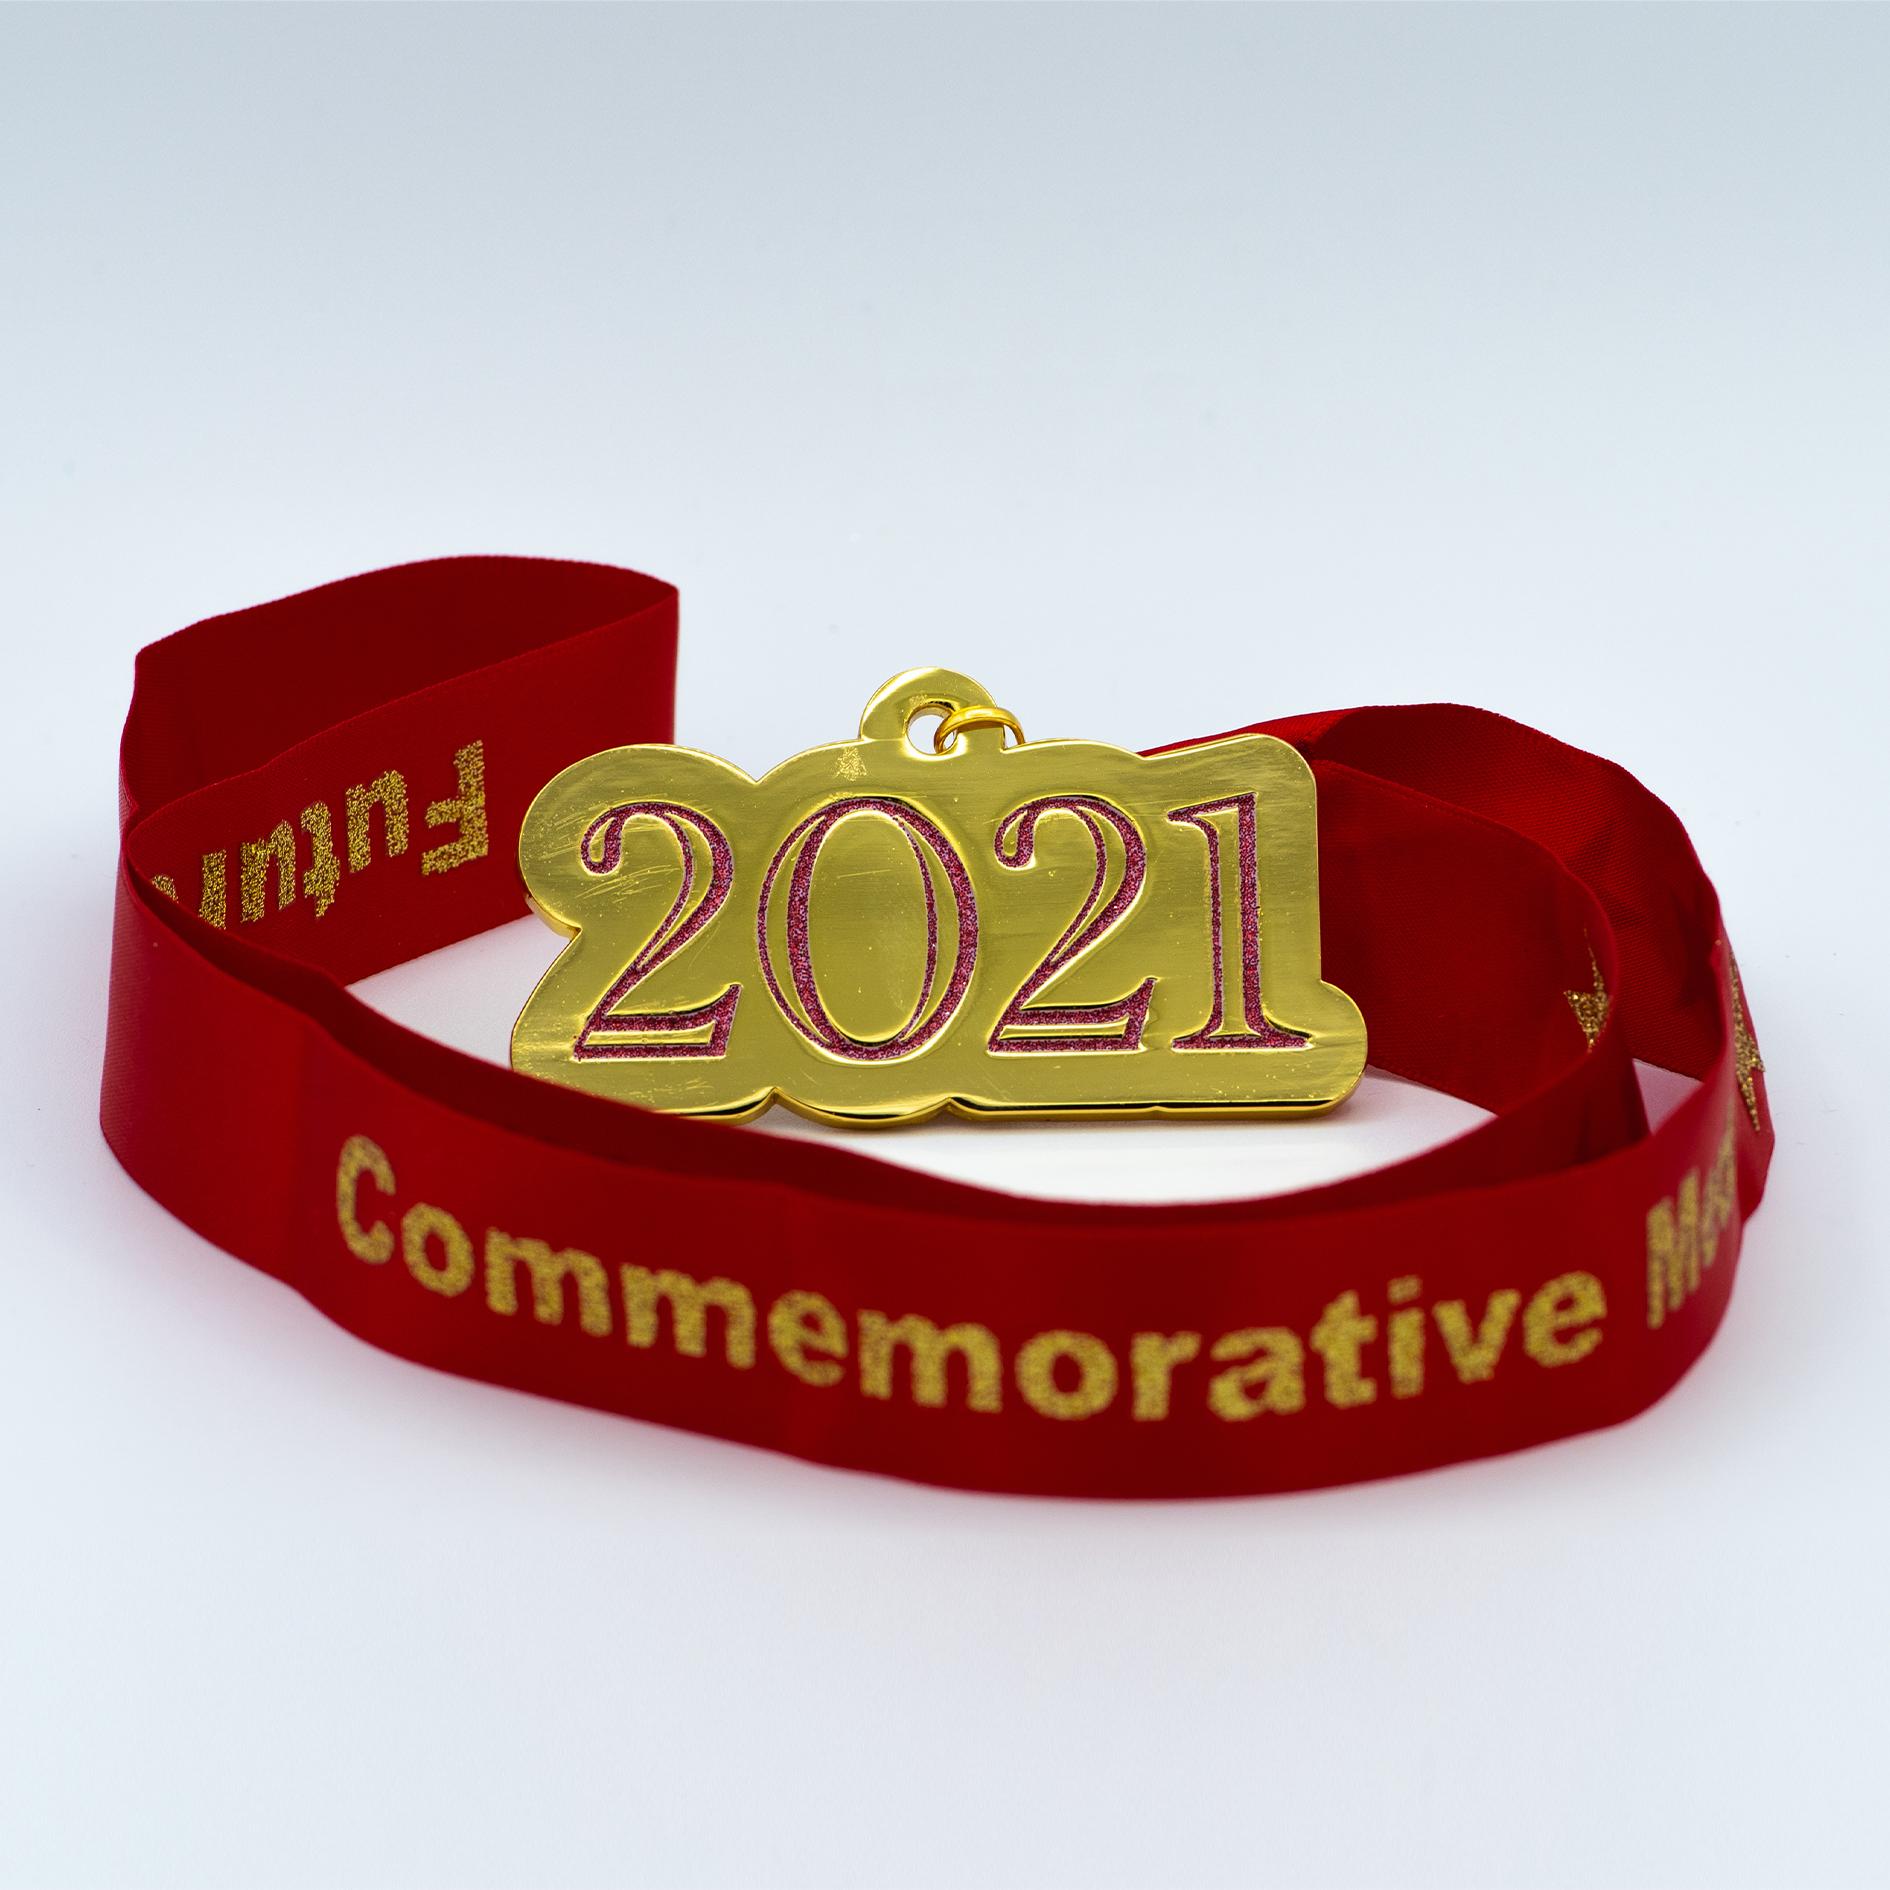 FC Internationals 2021 Commemorative Medal